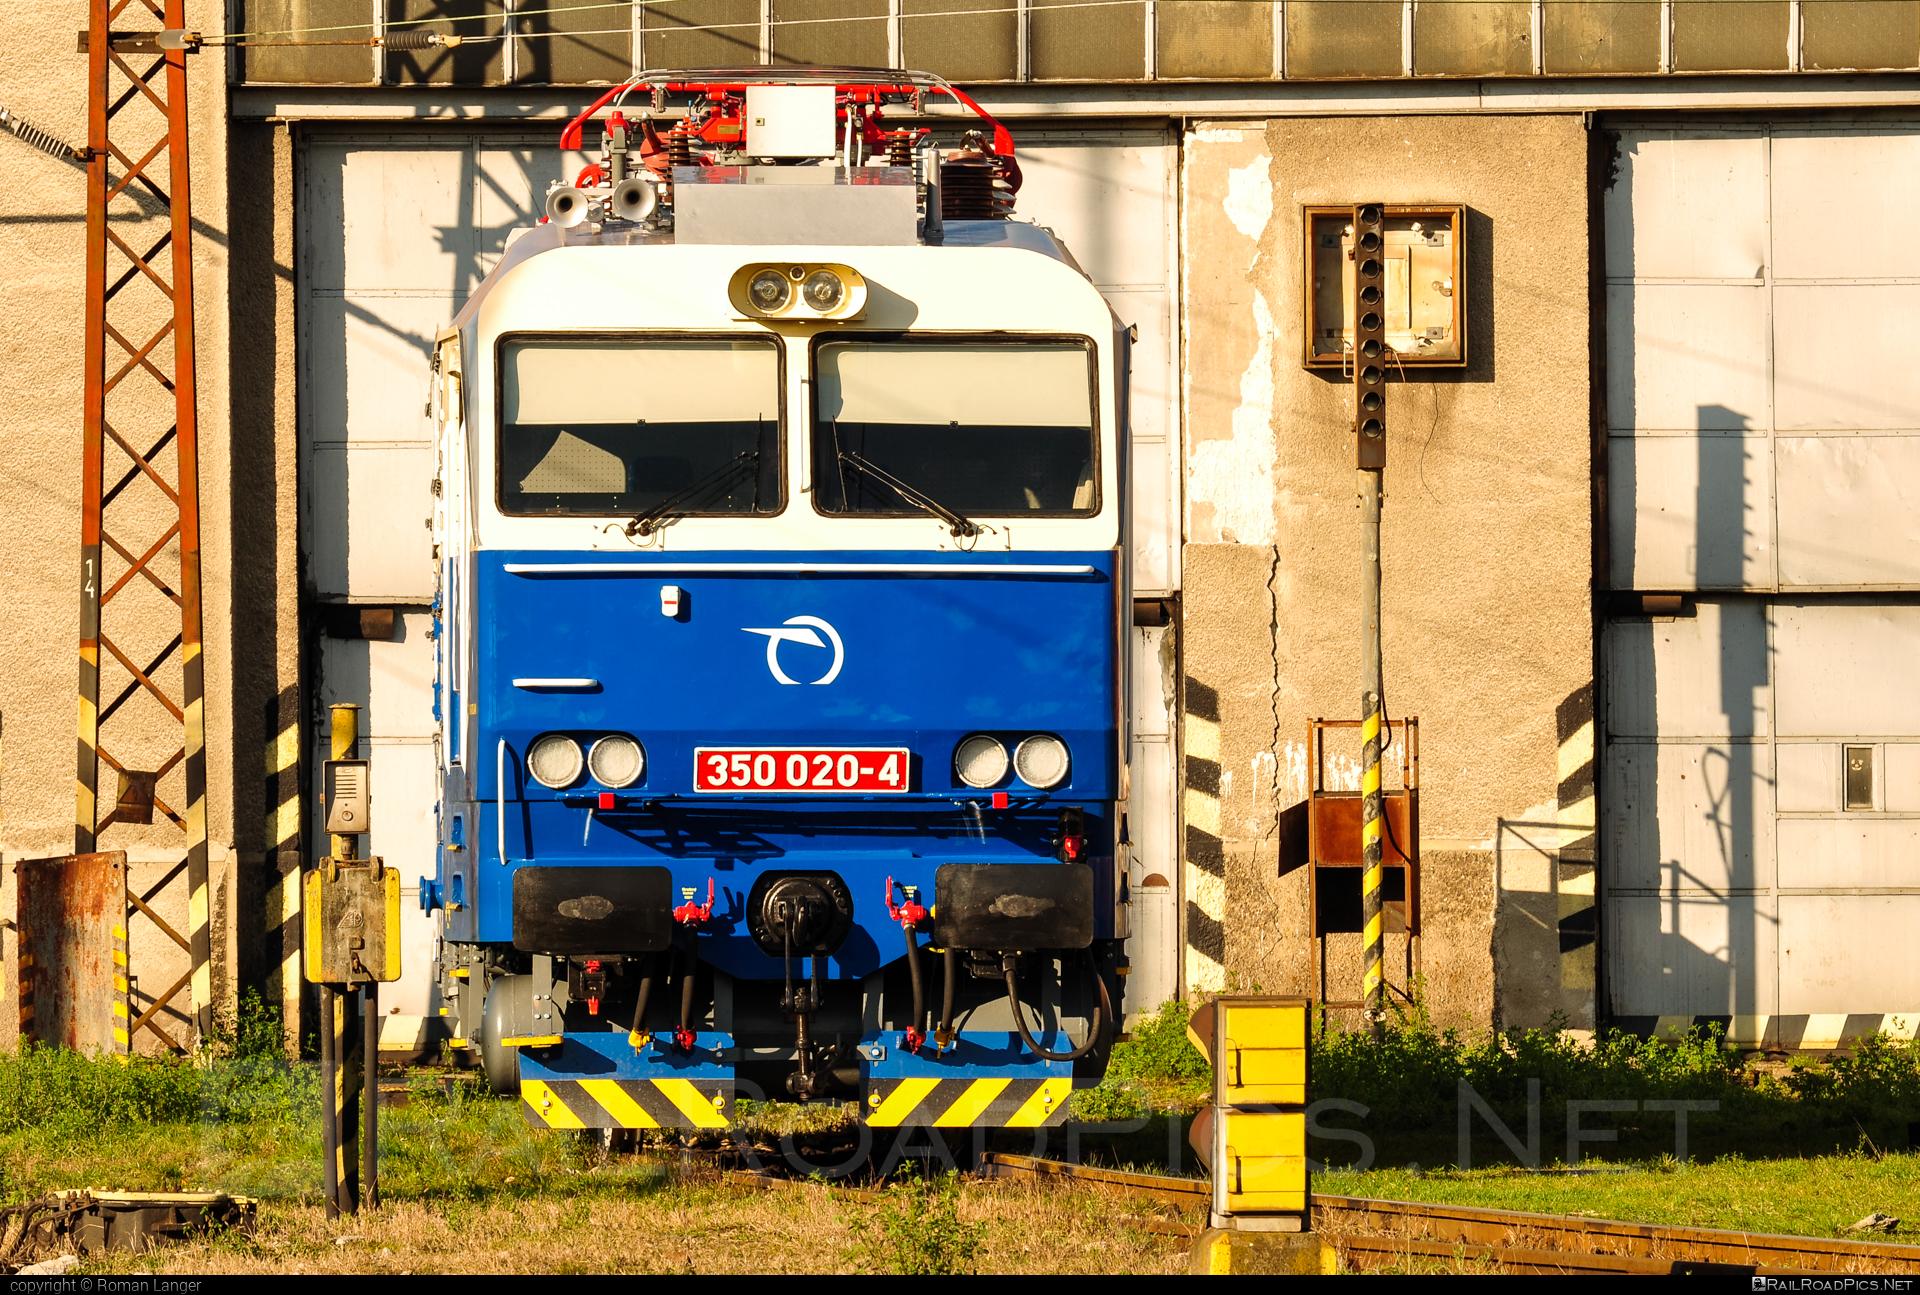 Škoda 55E - 350 020-4 operated by Železničná Spoločnost' Slovensko, a.s. #ZeleznicnaSpolocnostSlovensko #gorila #locomotive350 #skoda #skoda55e #zssk